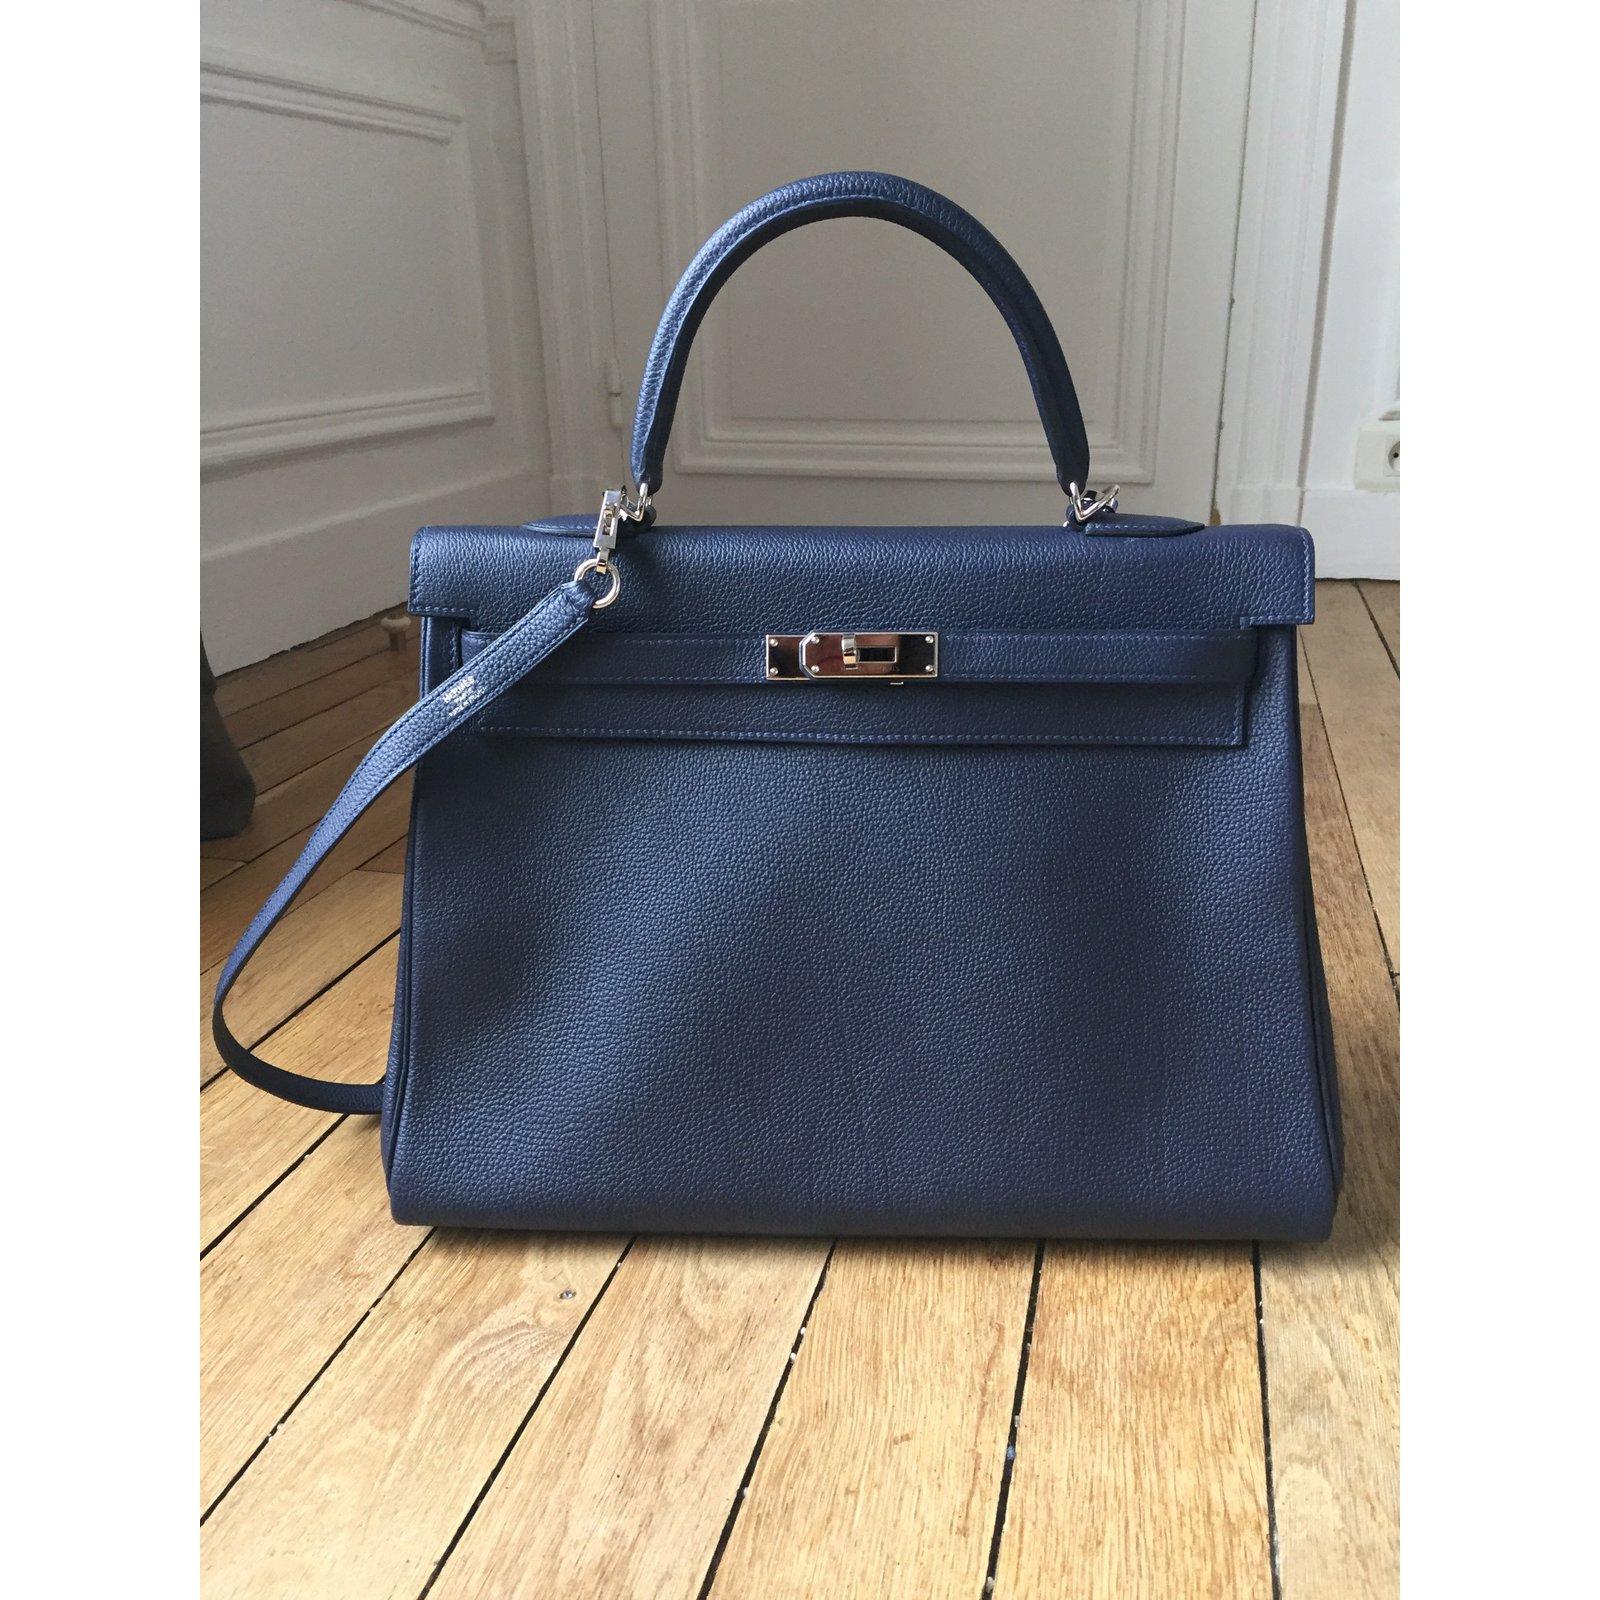 af6a191455 Sacs à main Hermès Sac Kelly 35Togo Bleu Nuit Cuir Bleu ref.35677 - Joli  Closet